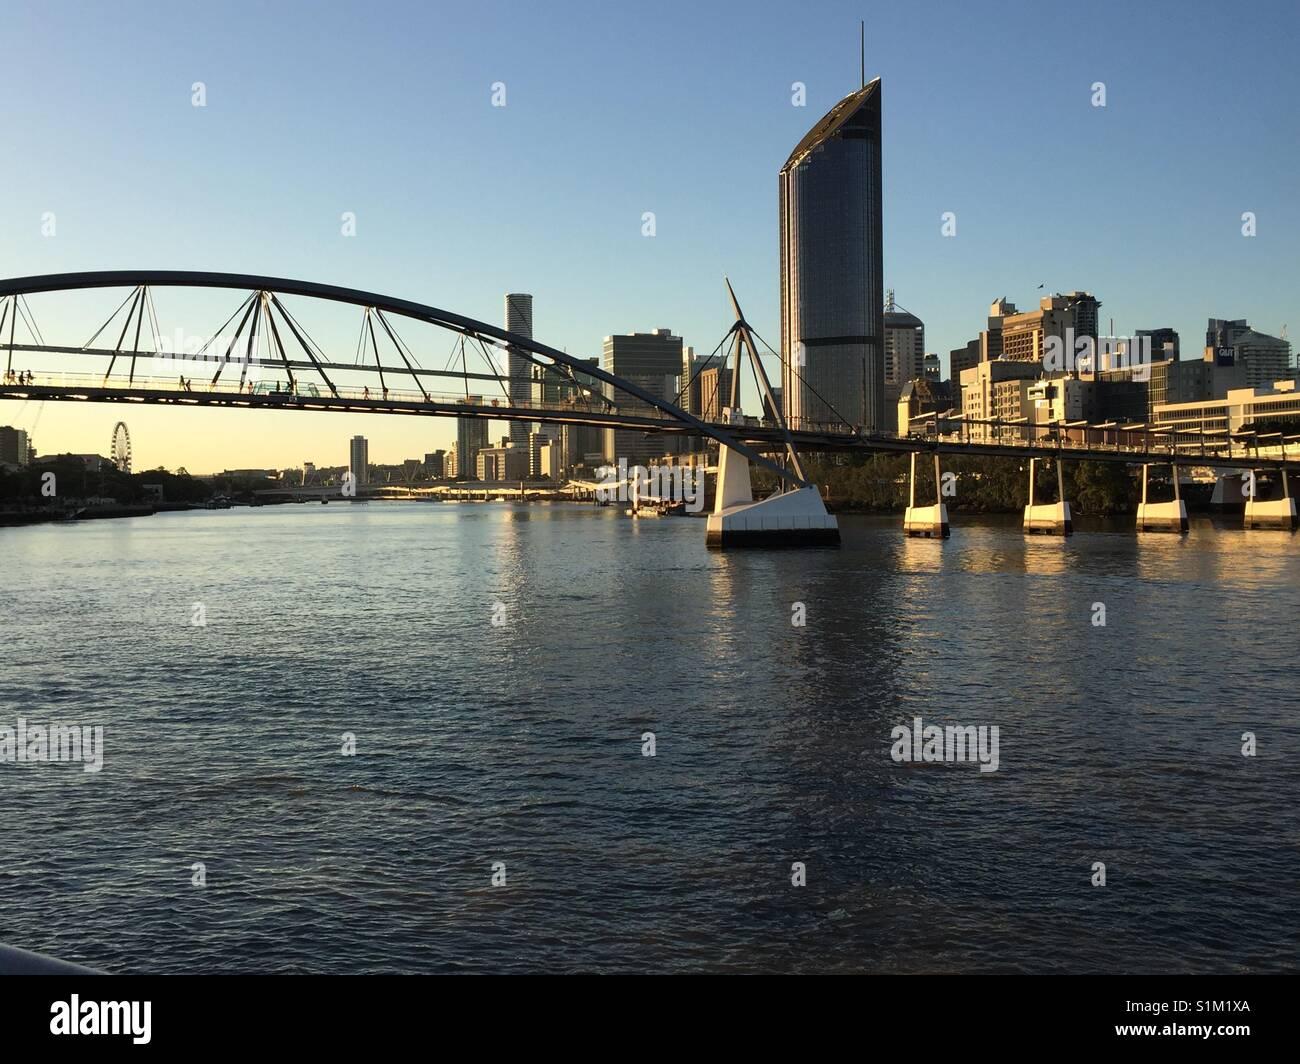 Brisbane City, Goodwill Bridge, Brisbane River, - Stock Image